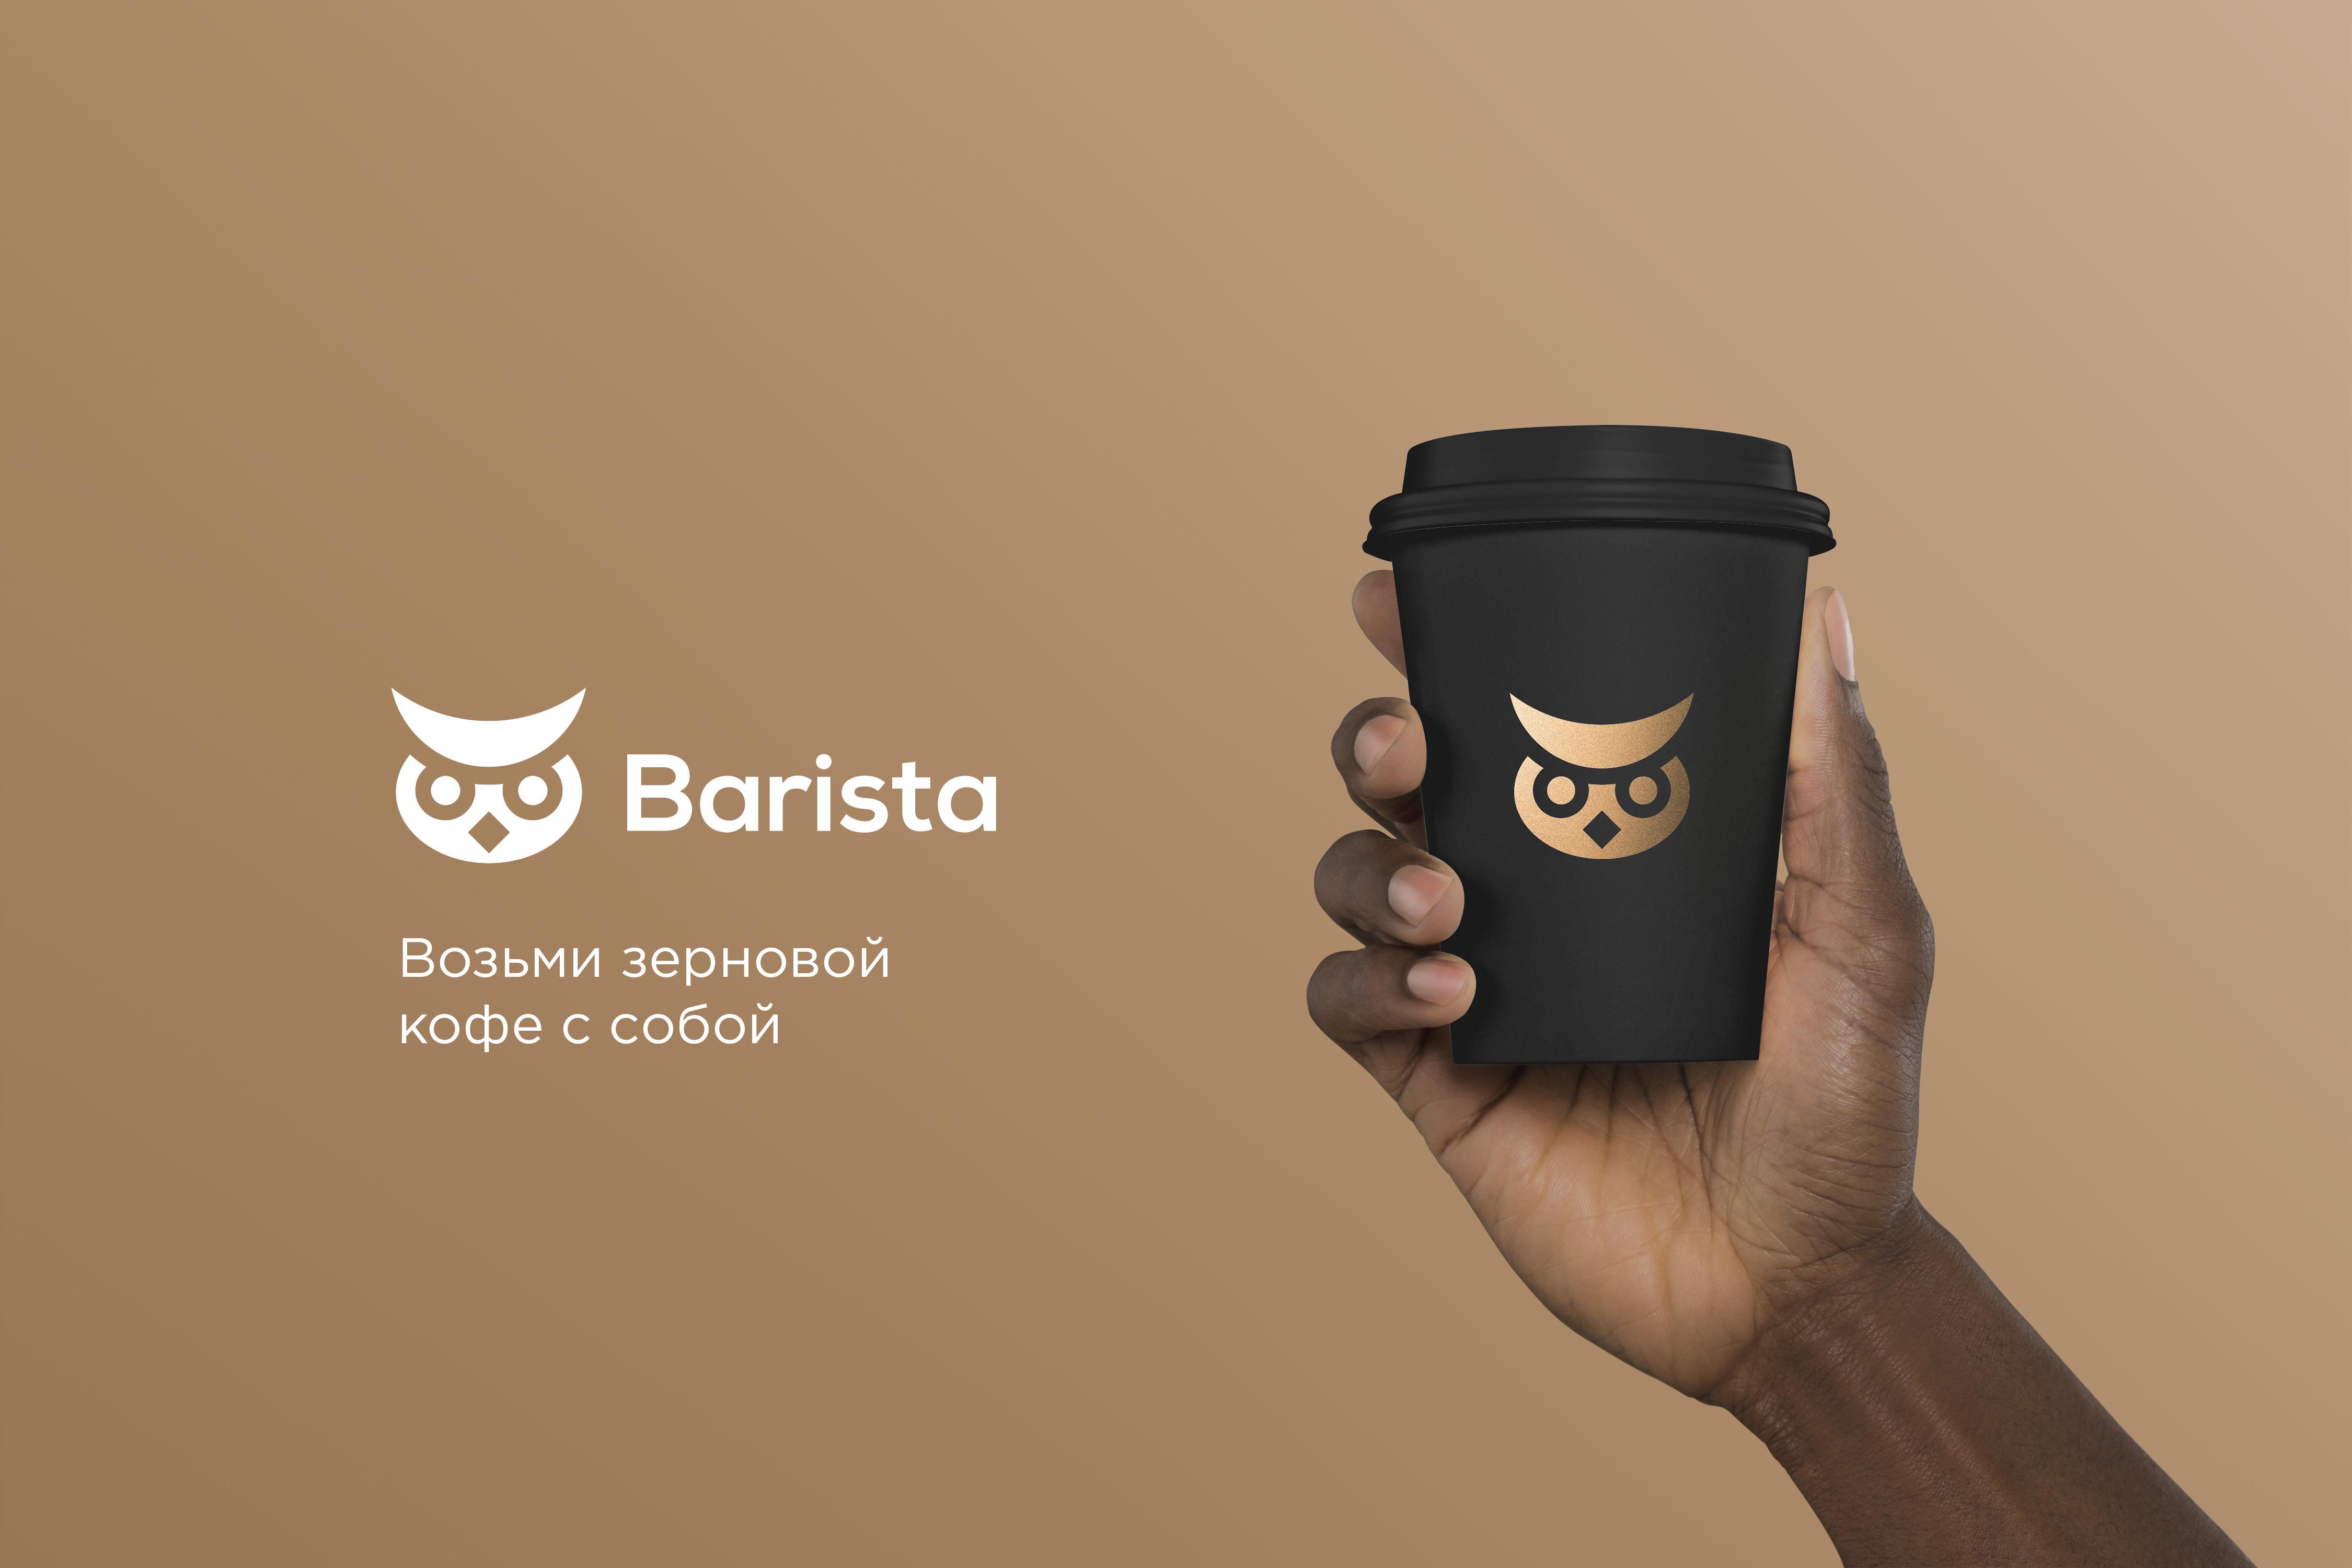 Ребрендинг логотипа сети кофеен фото f_7575e7f9898ecc19.jpg